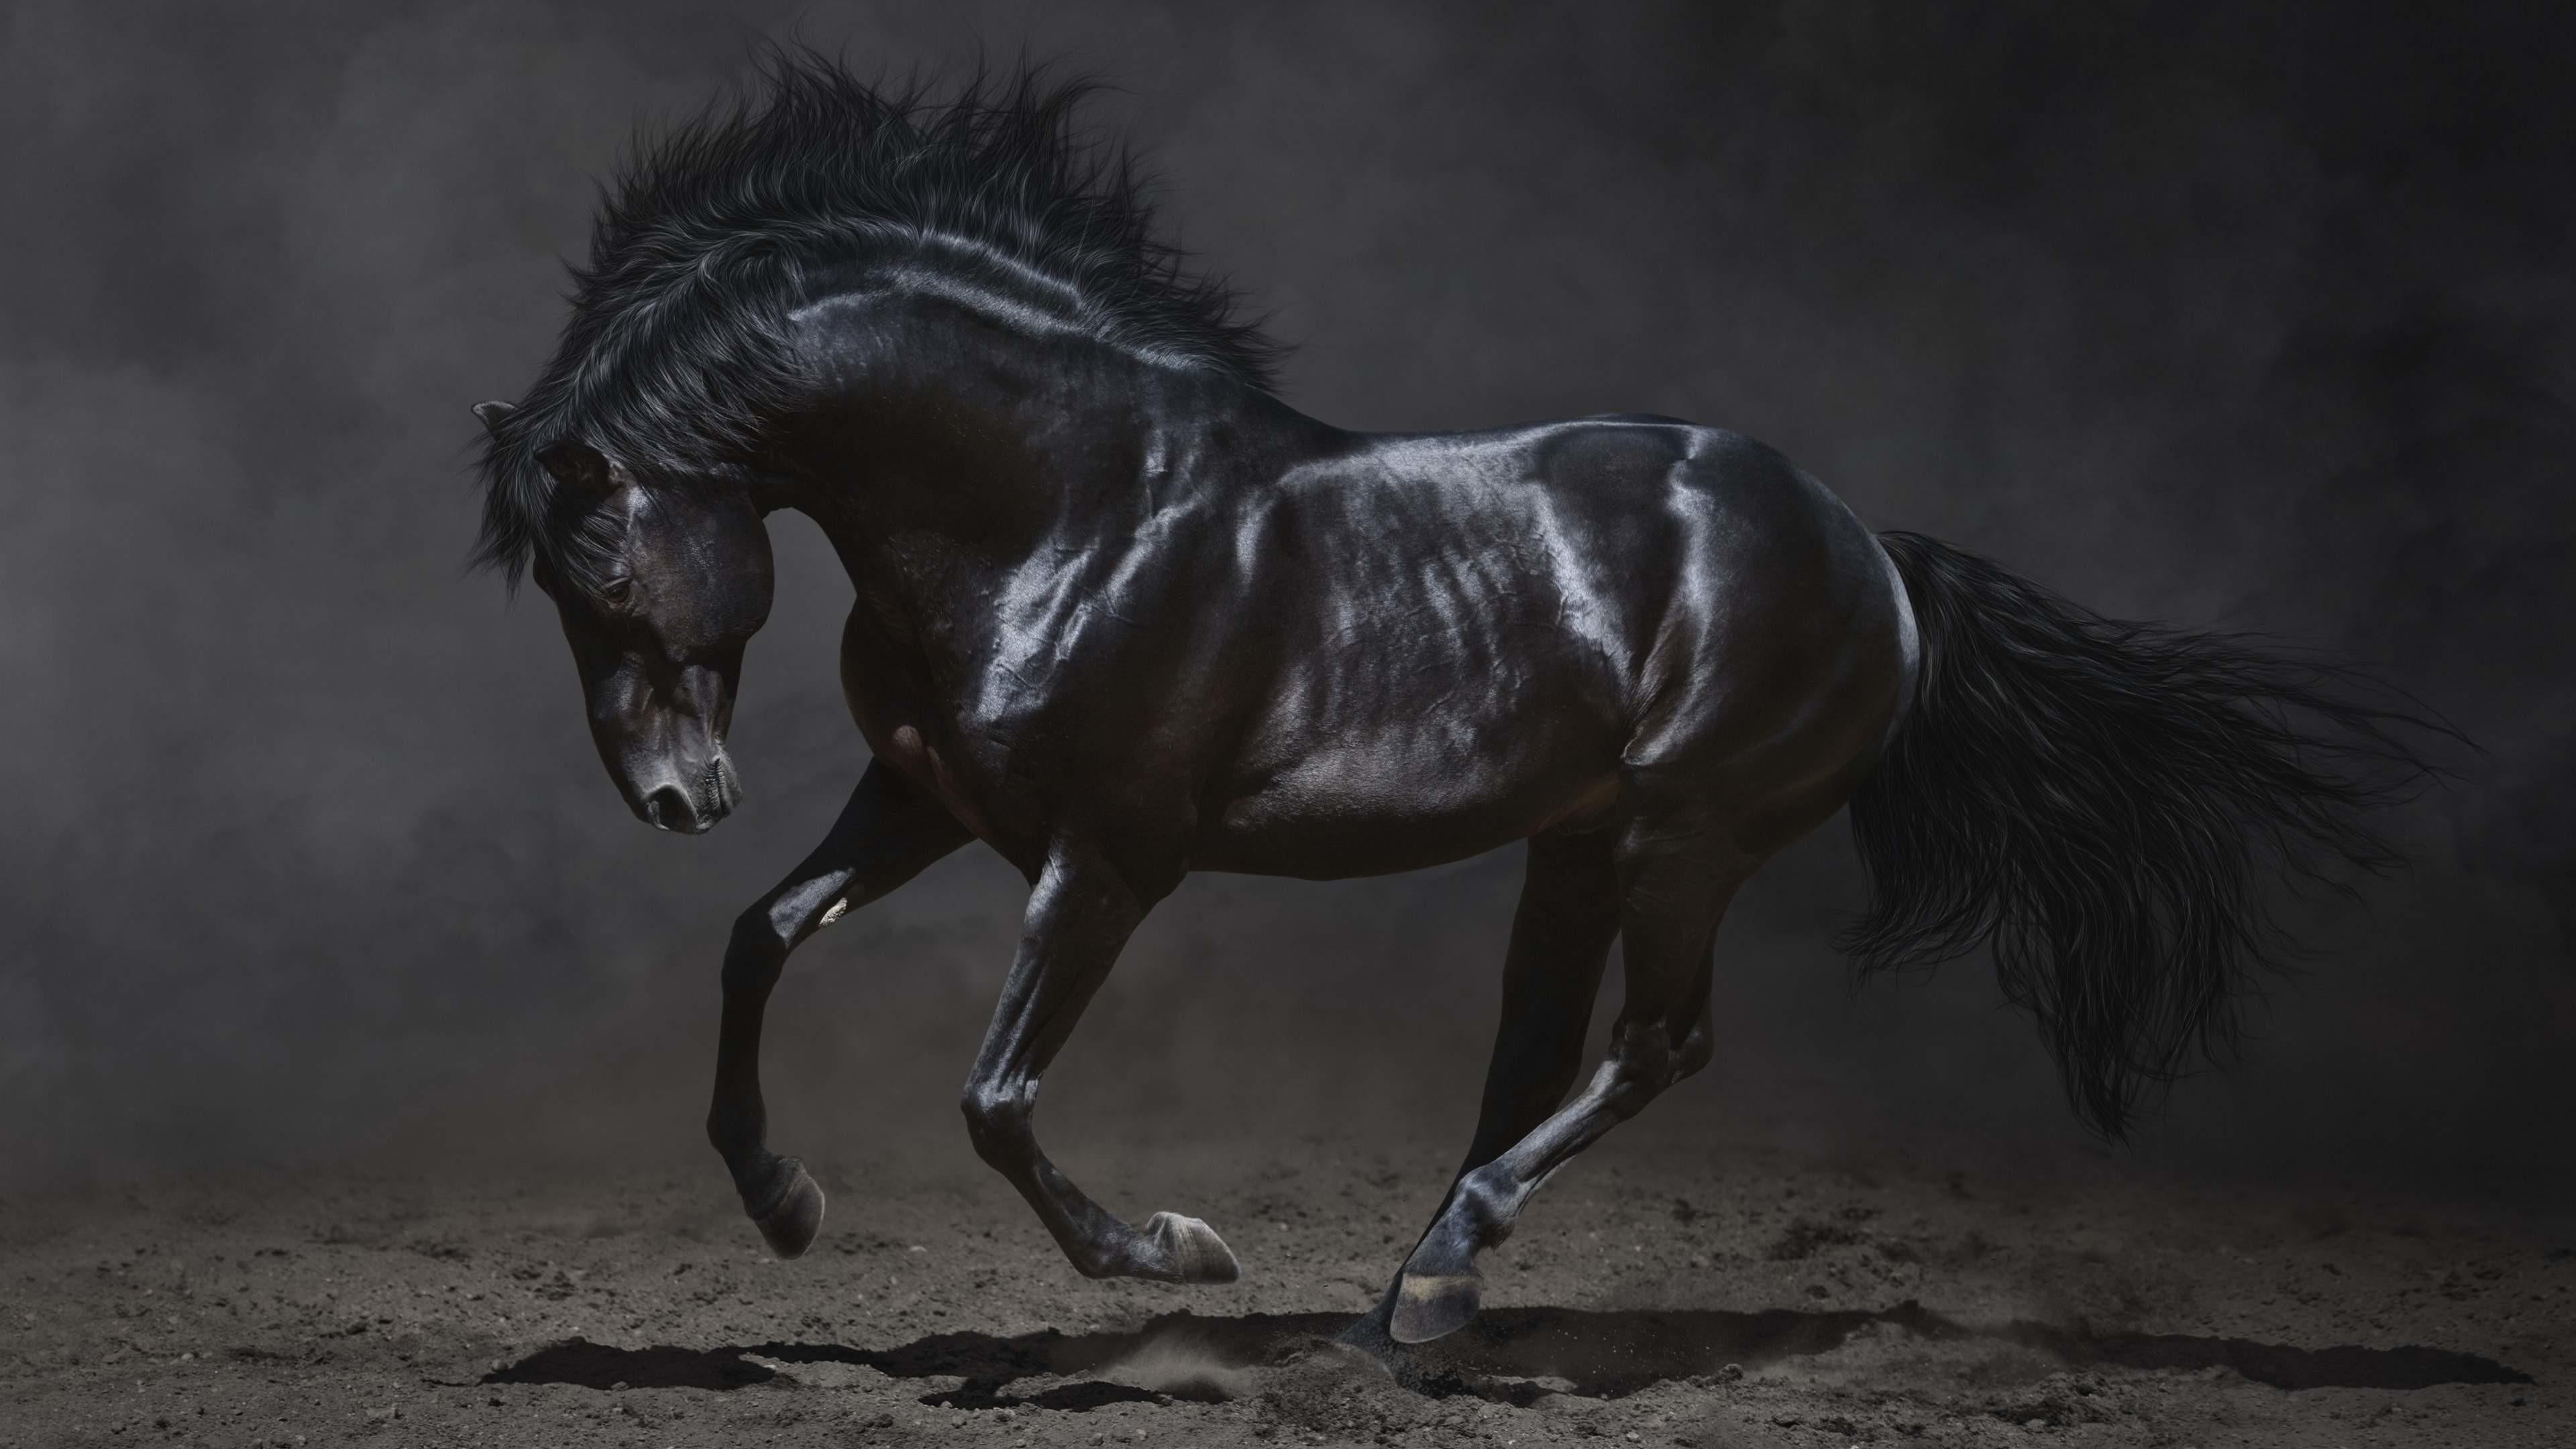 dark horse wallpaper,horse,mammal,vertebrate,stallion,mane